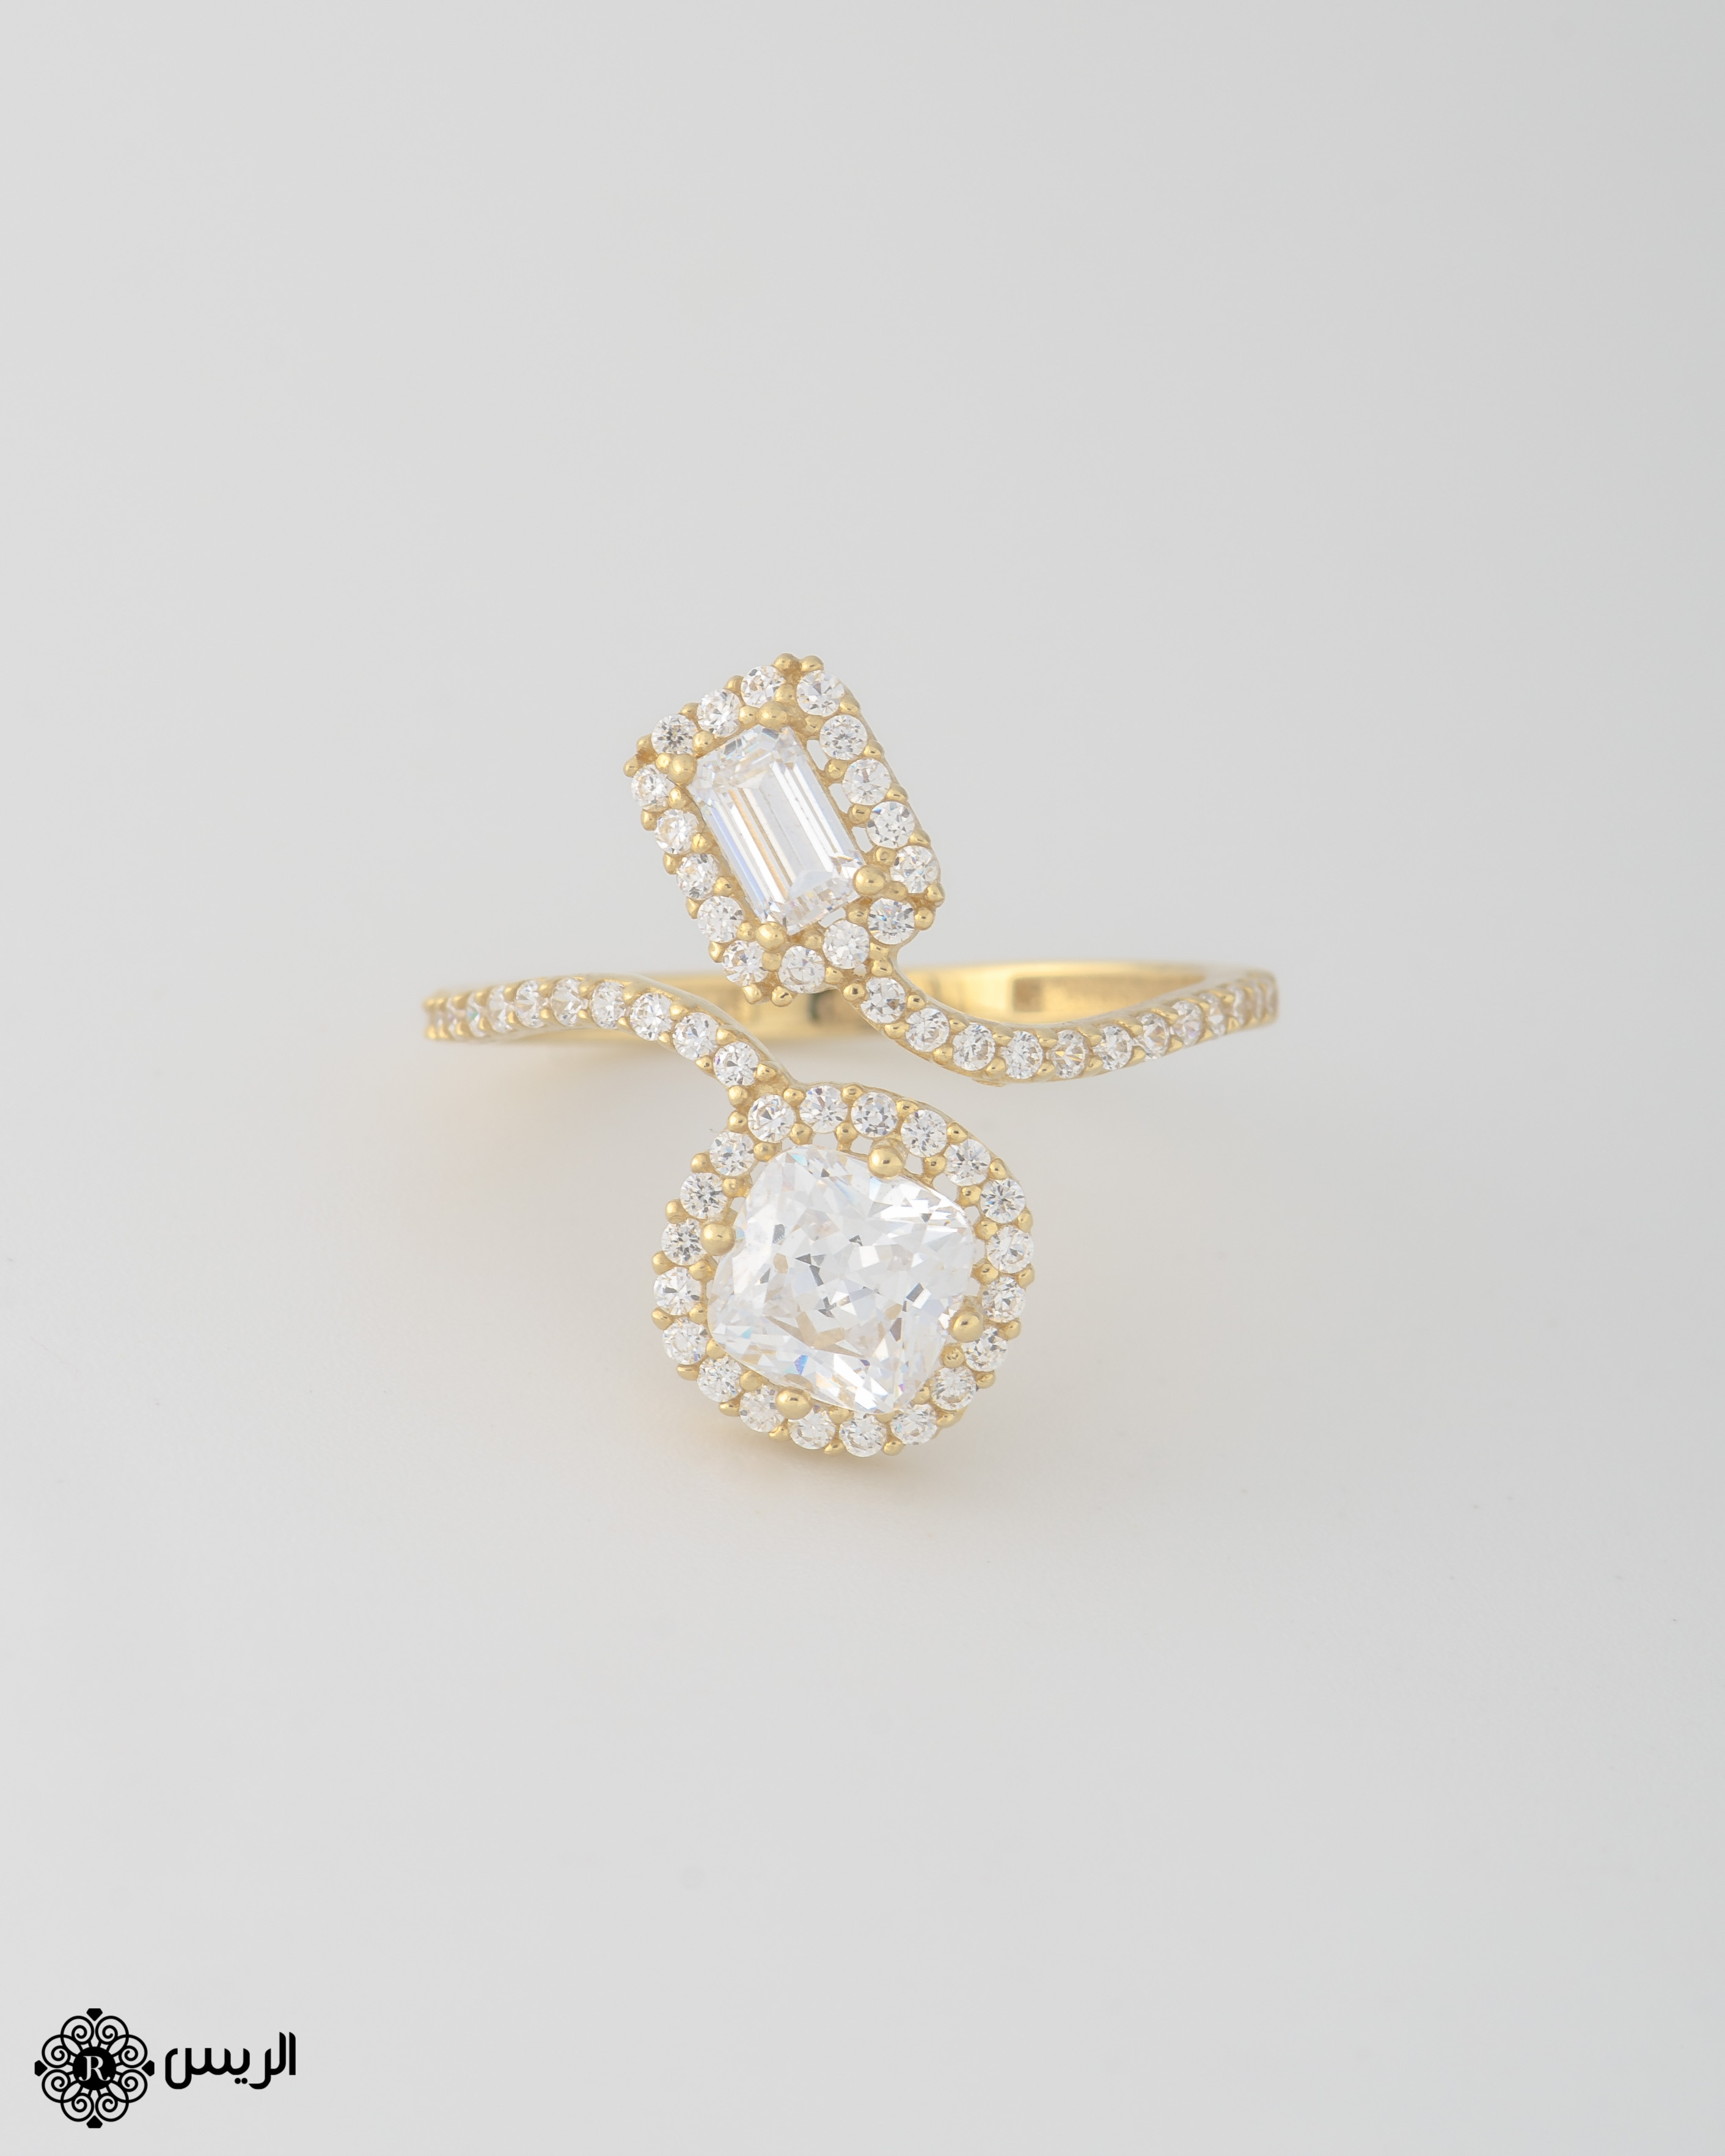 Raies jewelry Delicate Ring خاتم كلاسيك الريس للمجوهرات